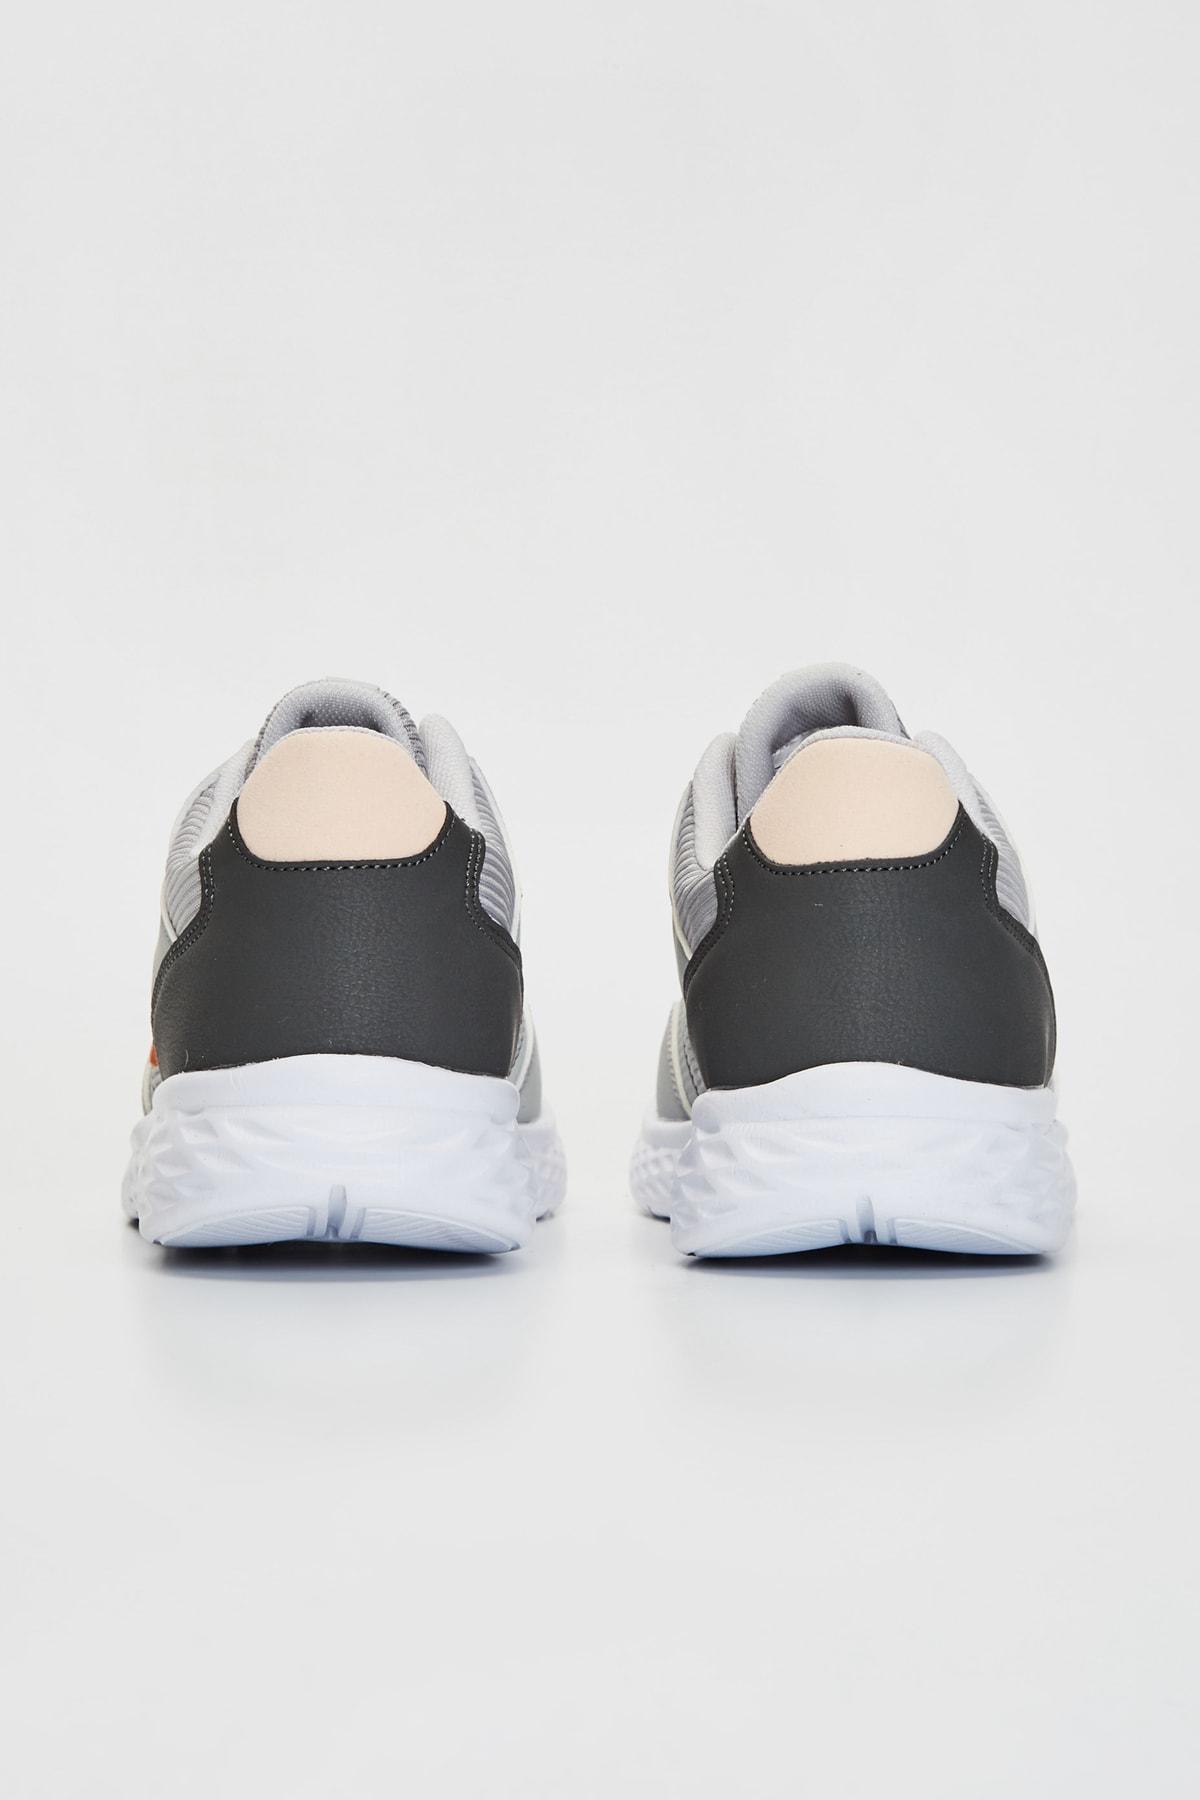 LC Waikiki Kadın Gri Sneaker 9WU760Z8 2